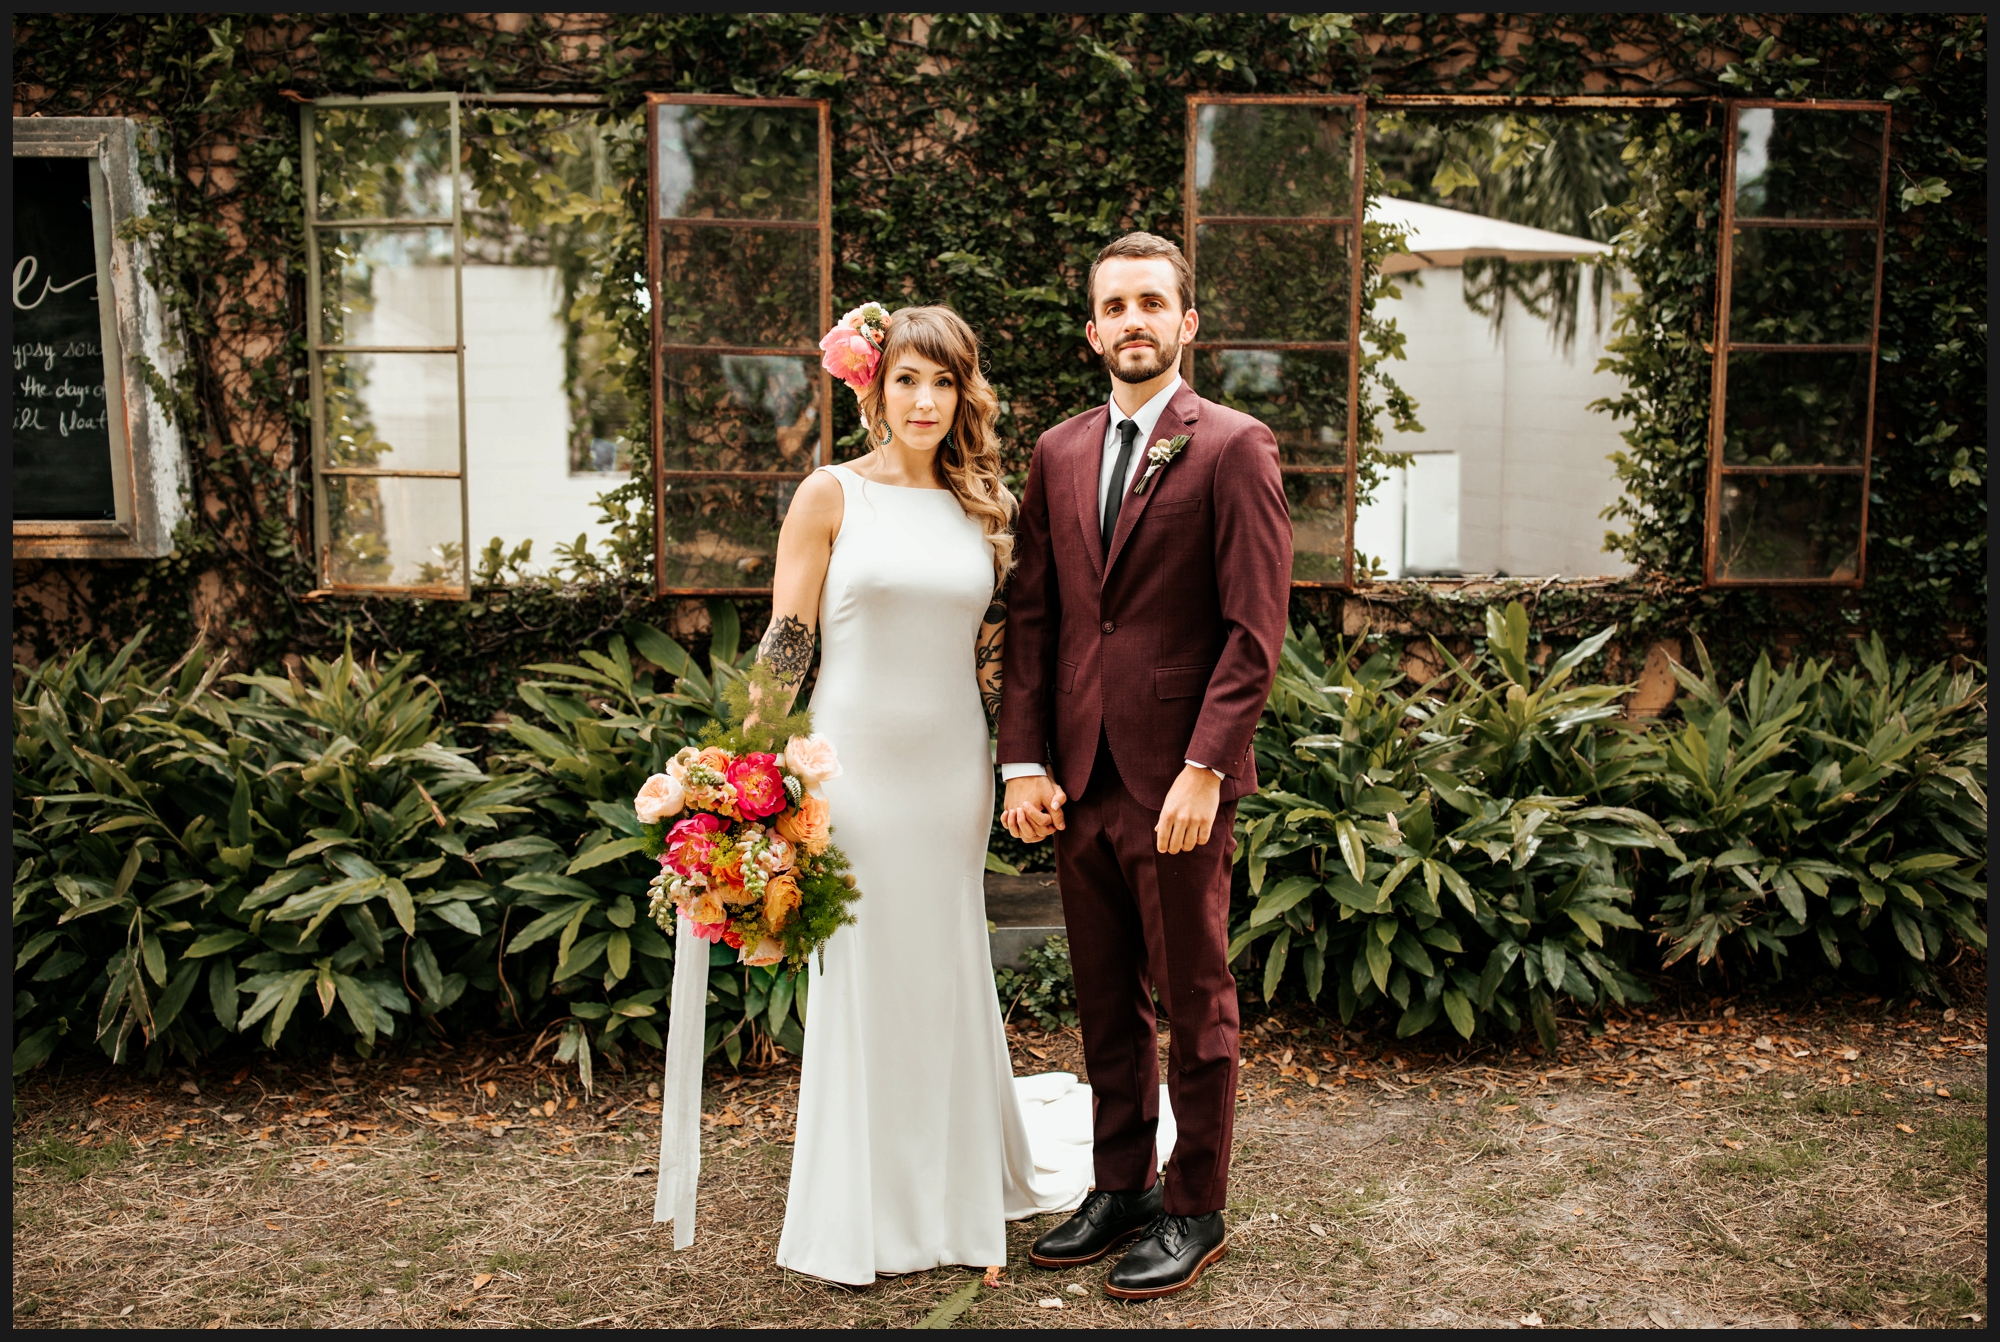 Orlando-Wedding-Photographer-destination-wedding-photographer-florida-wedding-photographer-bohemian-wedding-photographer_1988.jpg